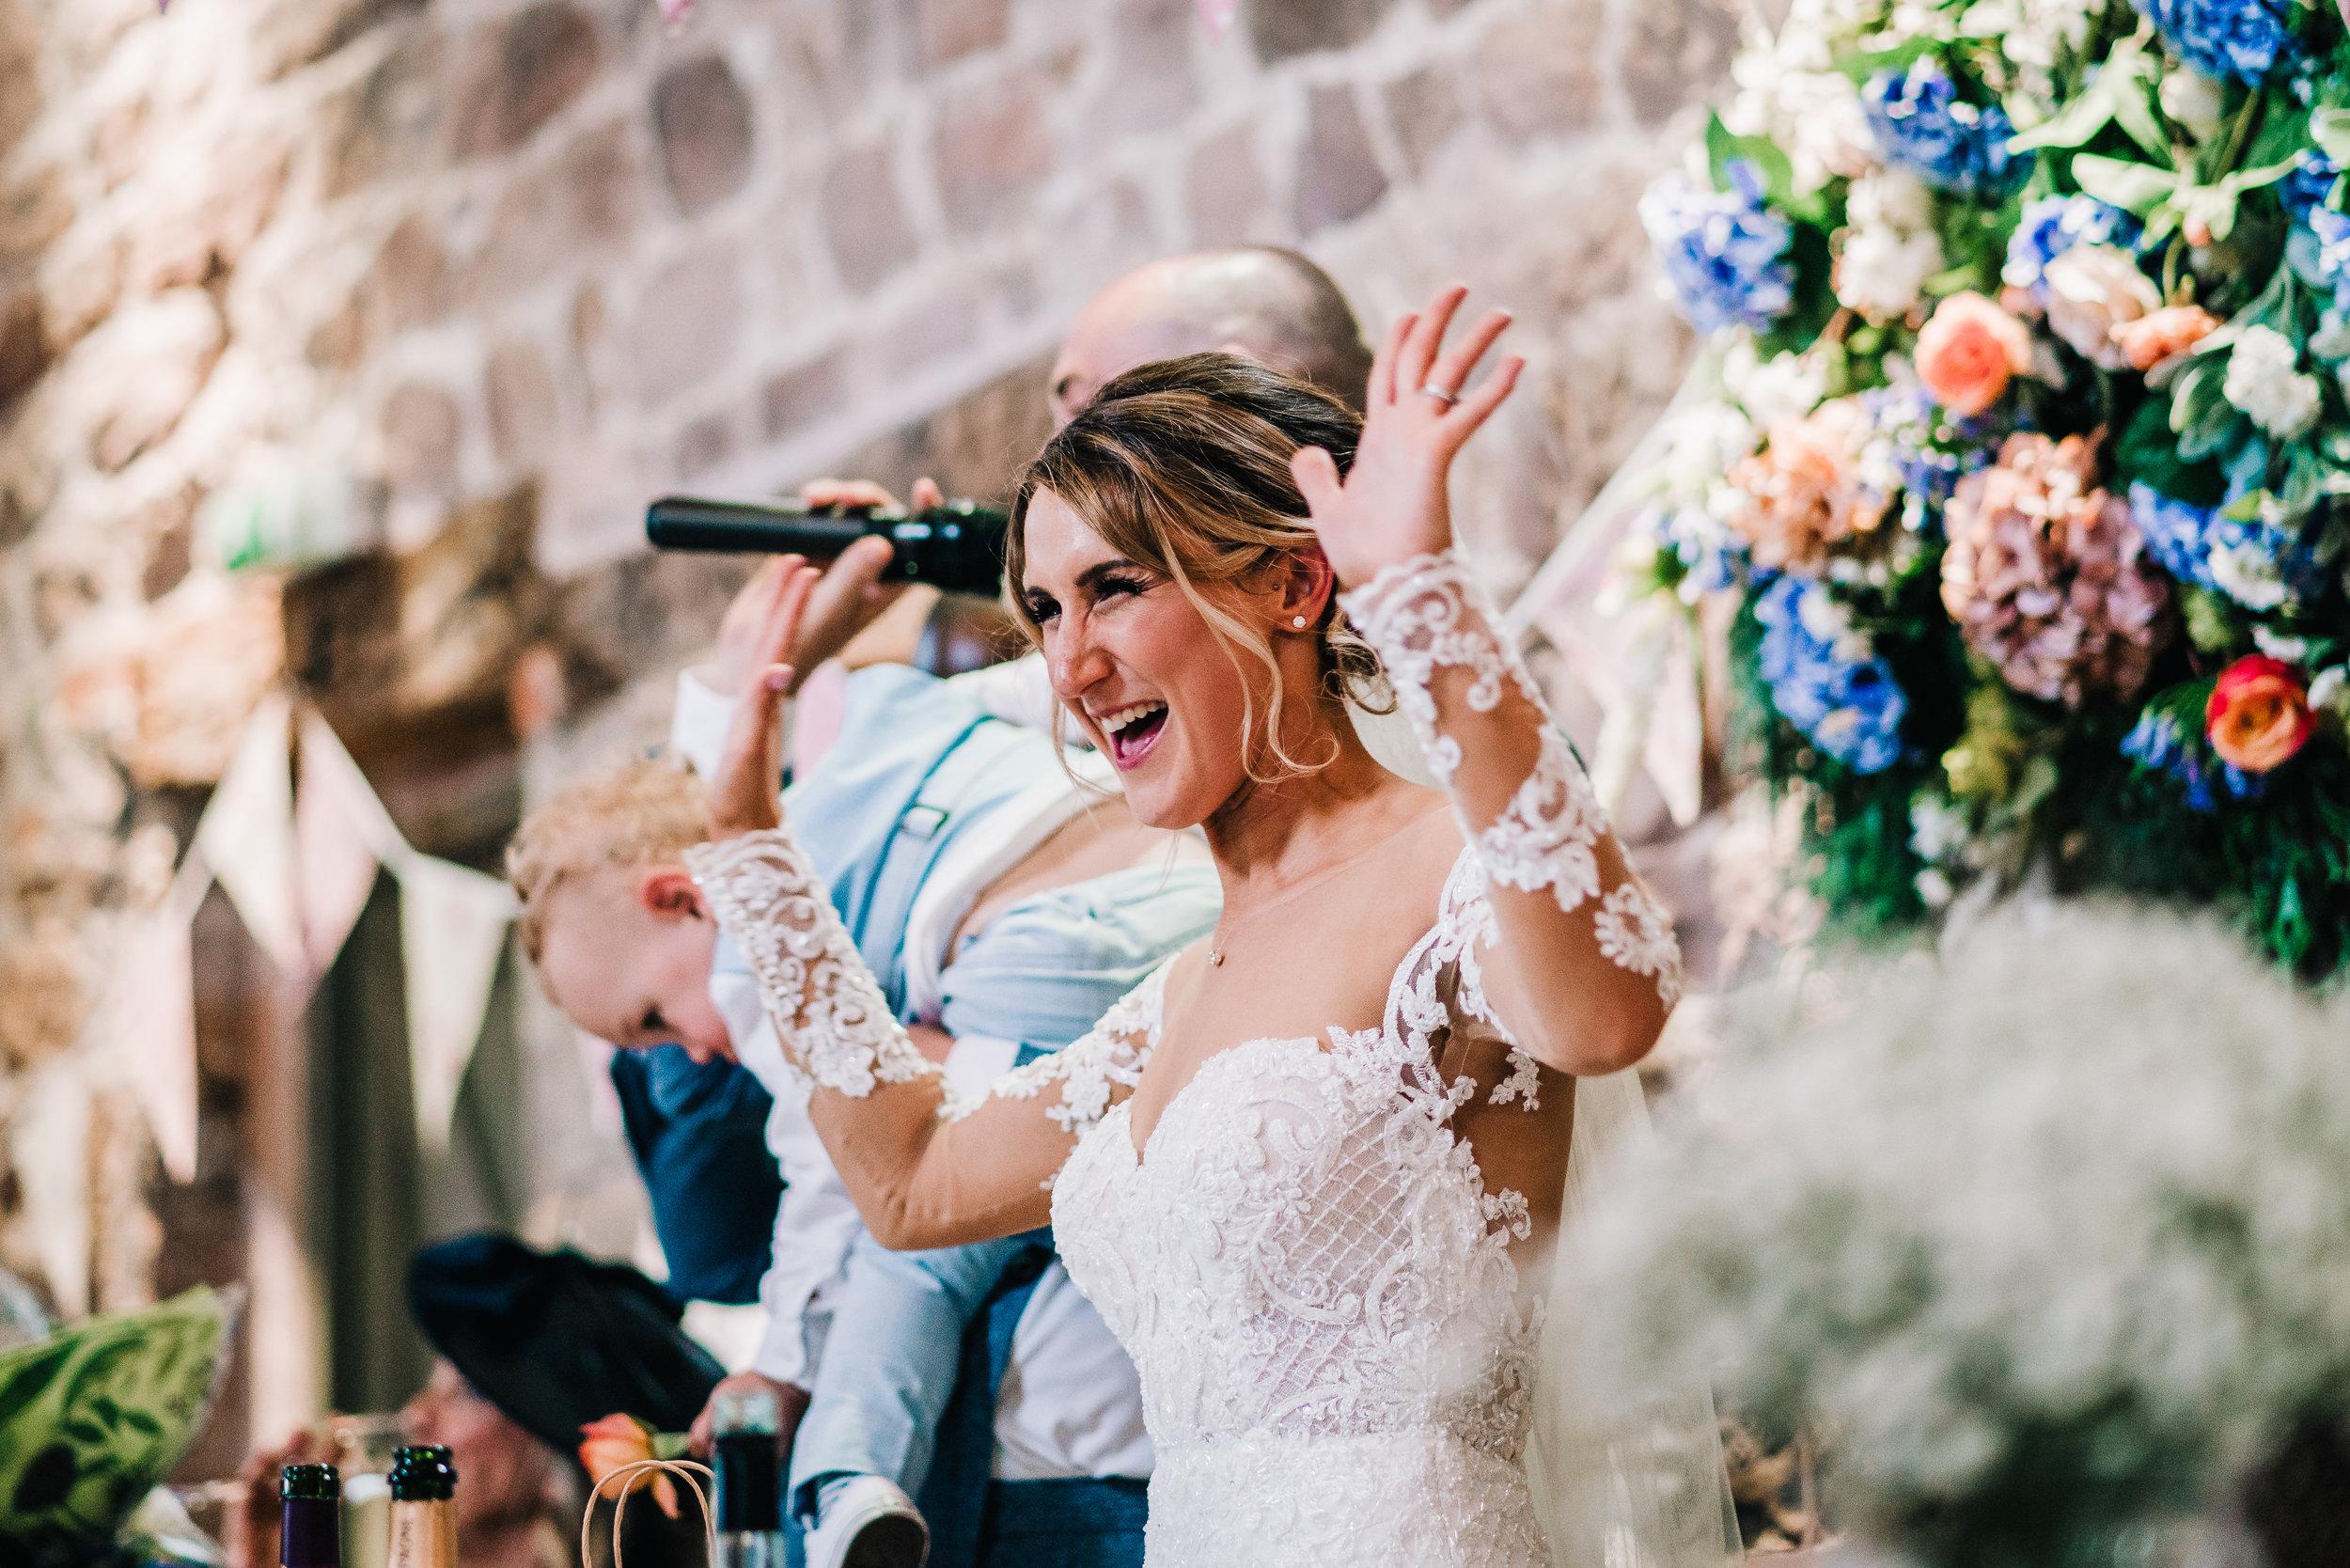 HAPPY BRIDE SMILING AT THE ASHES WEDDING BARN VENUE